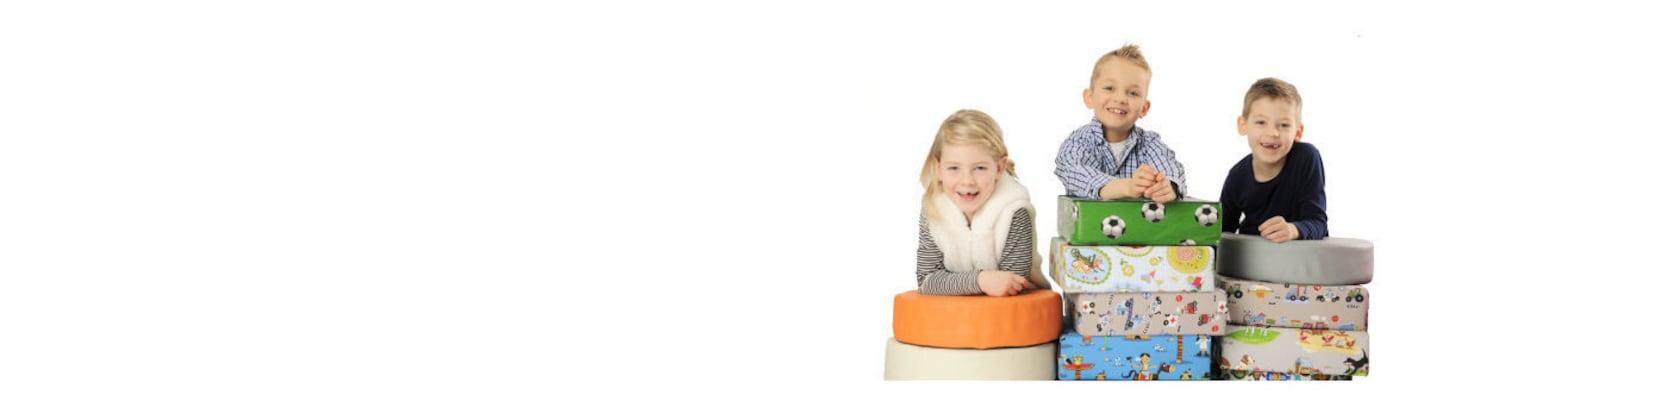 Faultiere H/öhe 10cm barfuss Kinder Stuhl Sitzerh/öhungMotiv-Lederoptik f/ür Kleinkinder und Kinder ab 3 Jahre